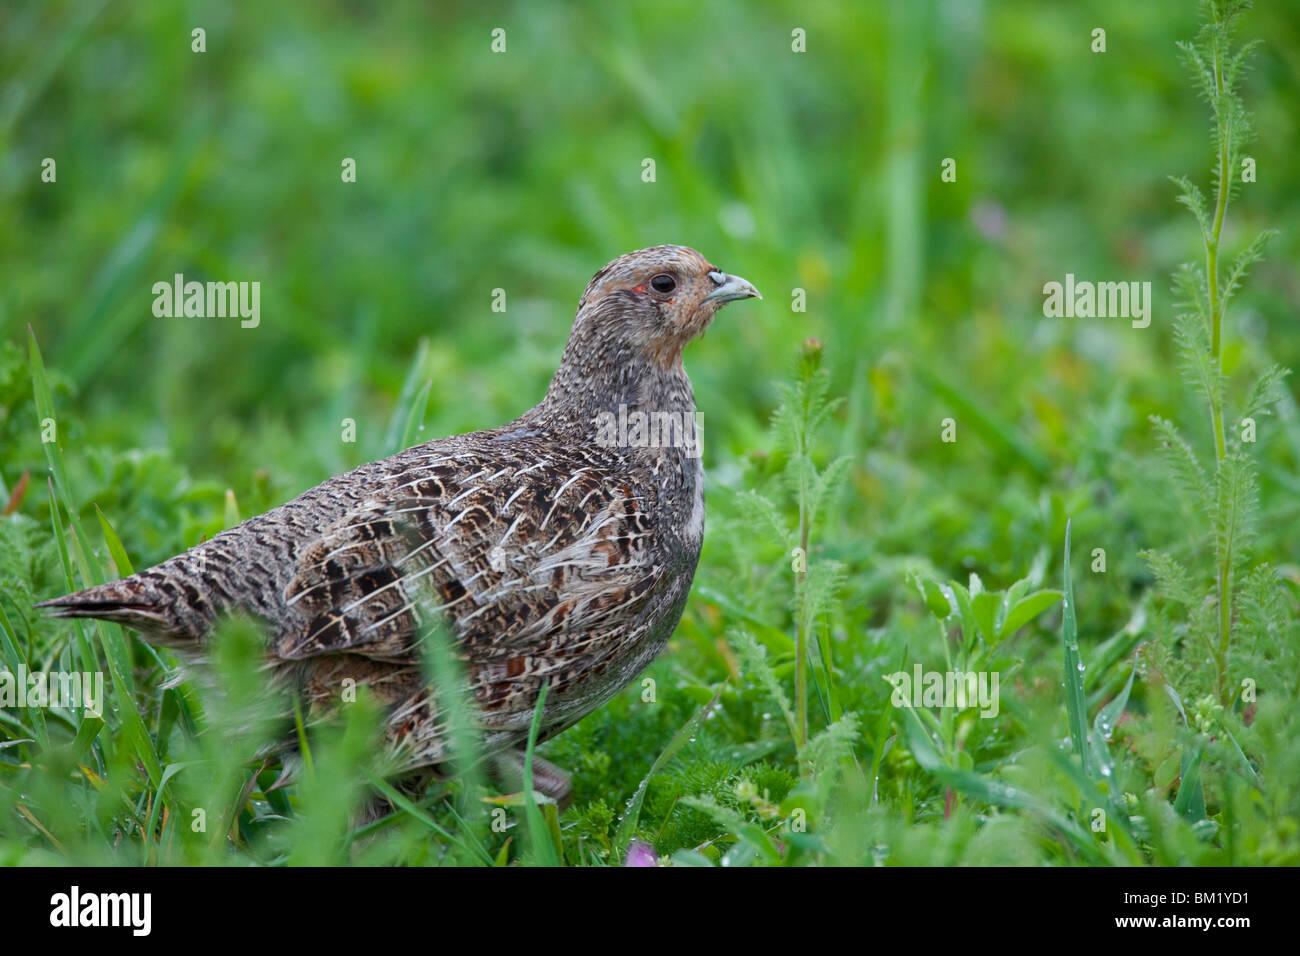 Grey Partridge (Perdix perdix) female in field, Germany - Stock Image